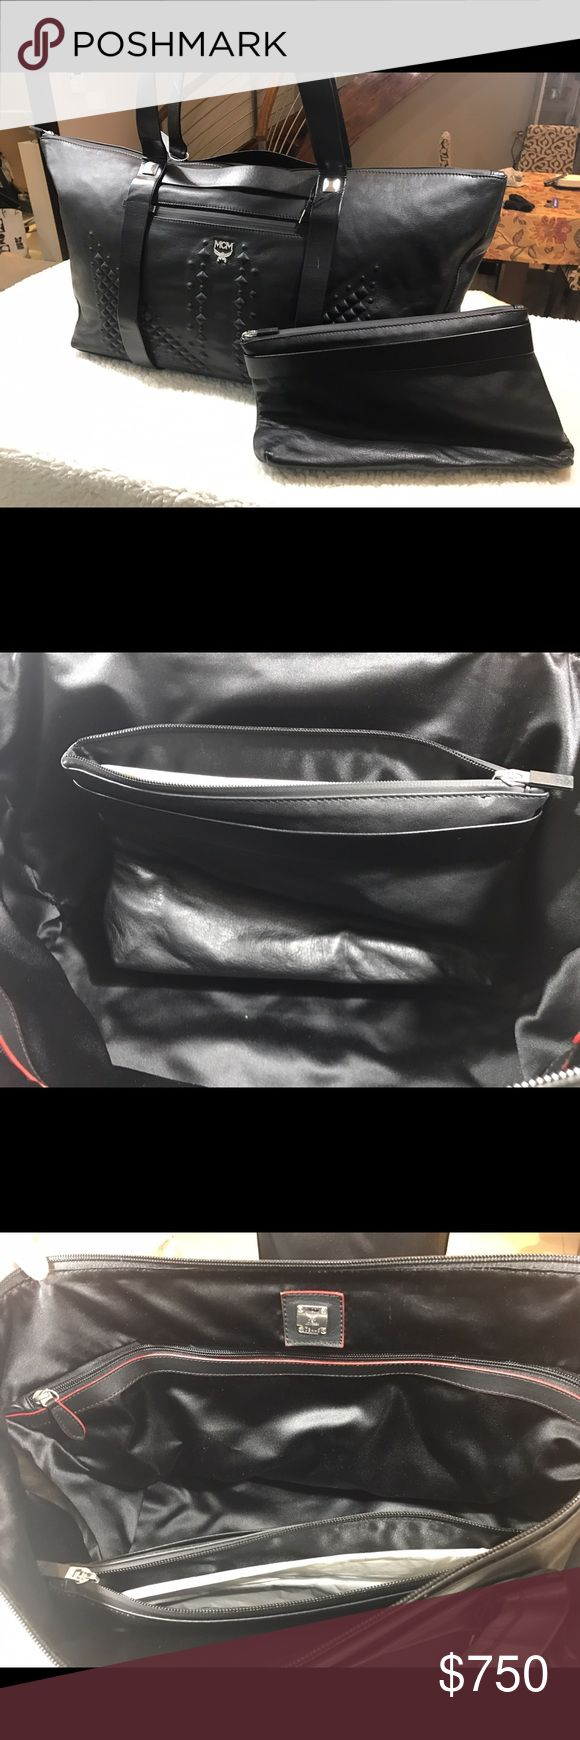 MCM unisex travel bag No flaws ! Original price retail for $1280 MCM Bags Travel Bags